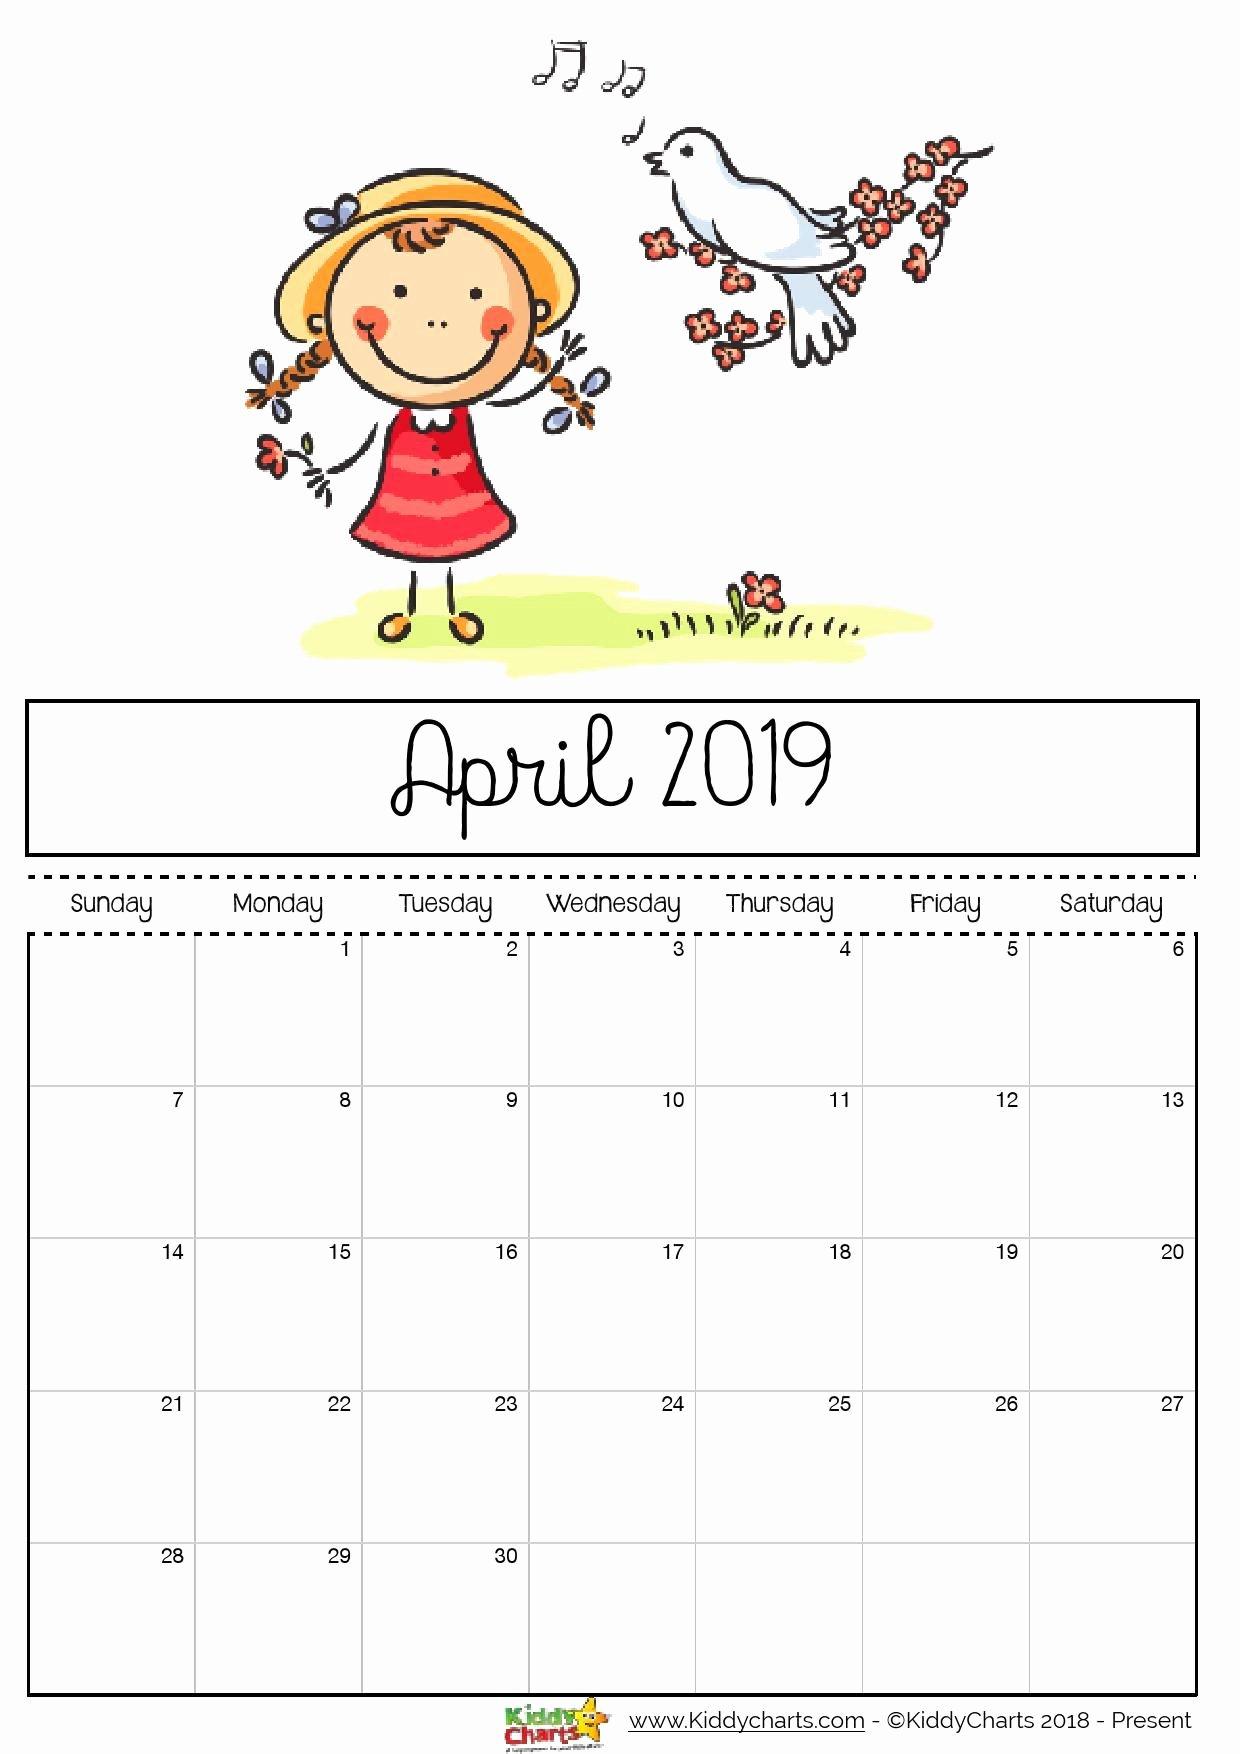 2019 Cute Calendar Printable Fresh Free Printable 2019 Calendar for Kids Rajzok